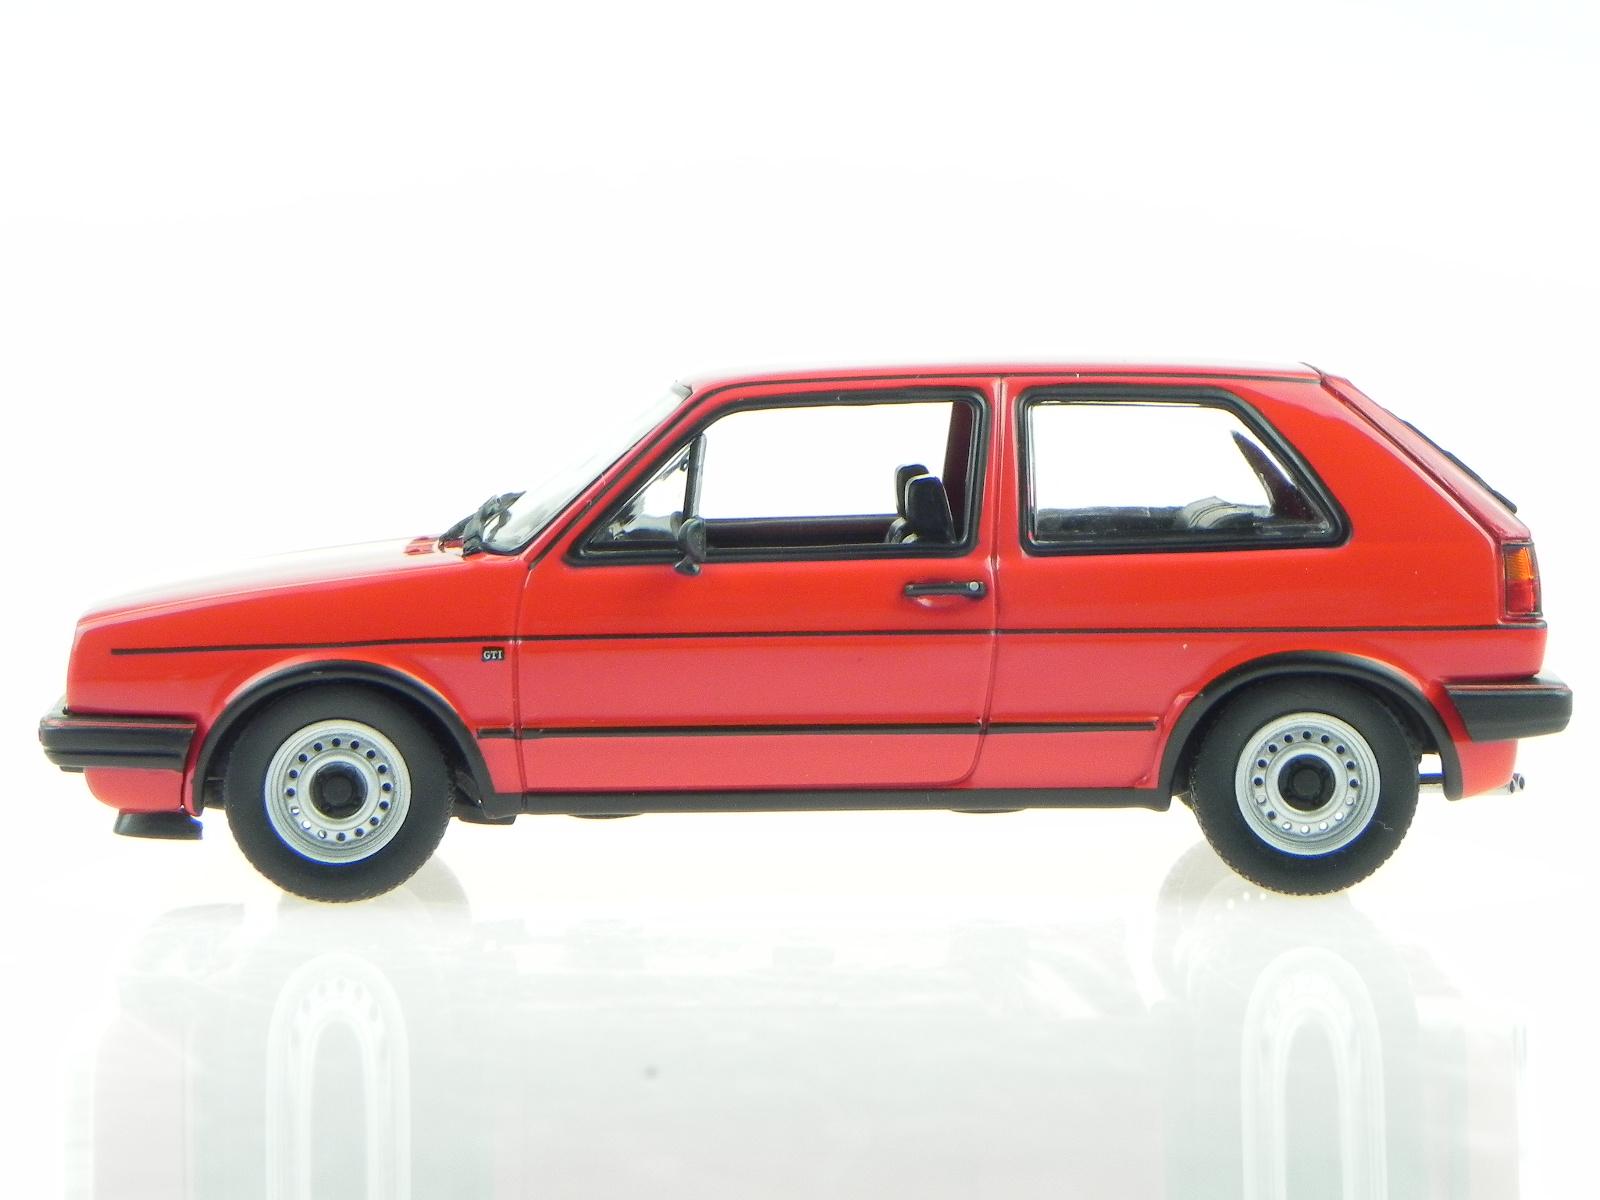 vw golf 2 gti 1985 rot modellauto 940054121 maxichamps 1. Black Bedroom Furniture Sets. Home Design Ideas